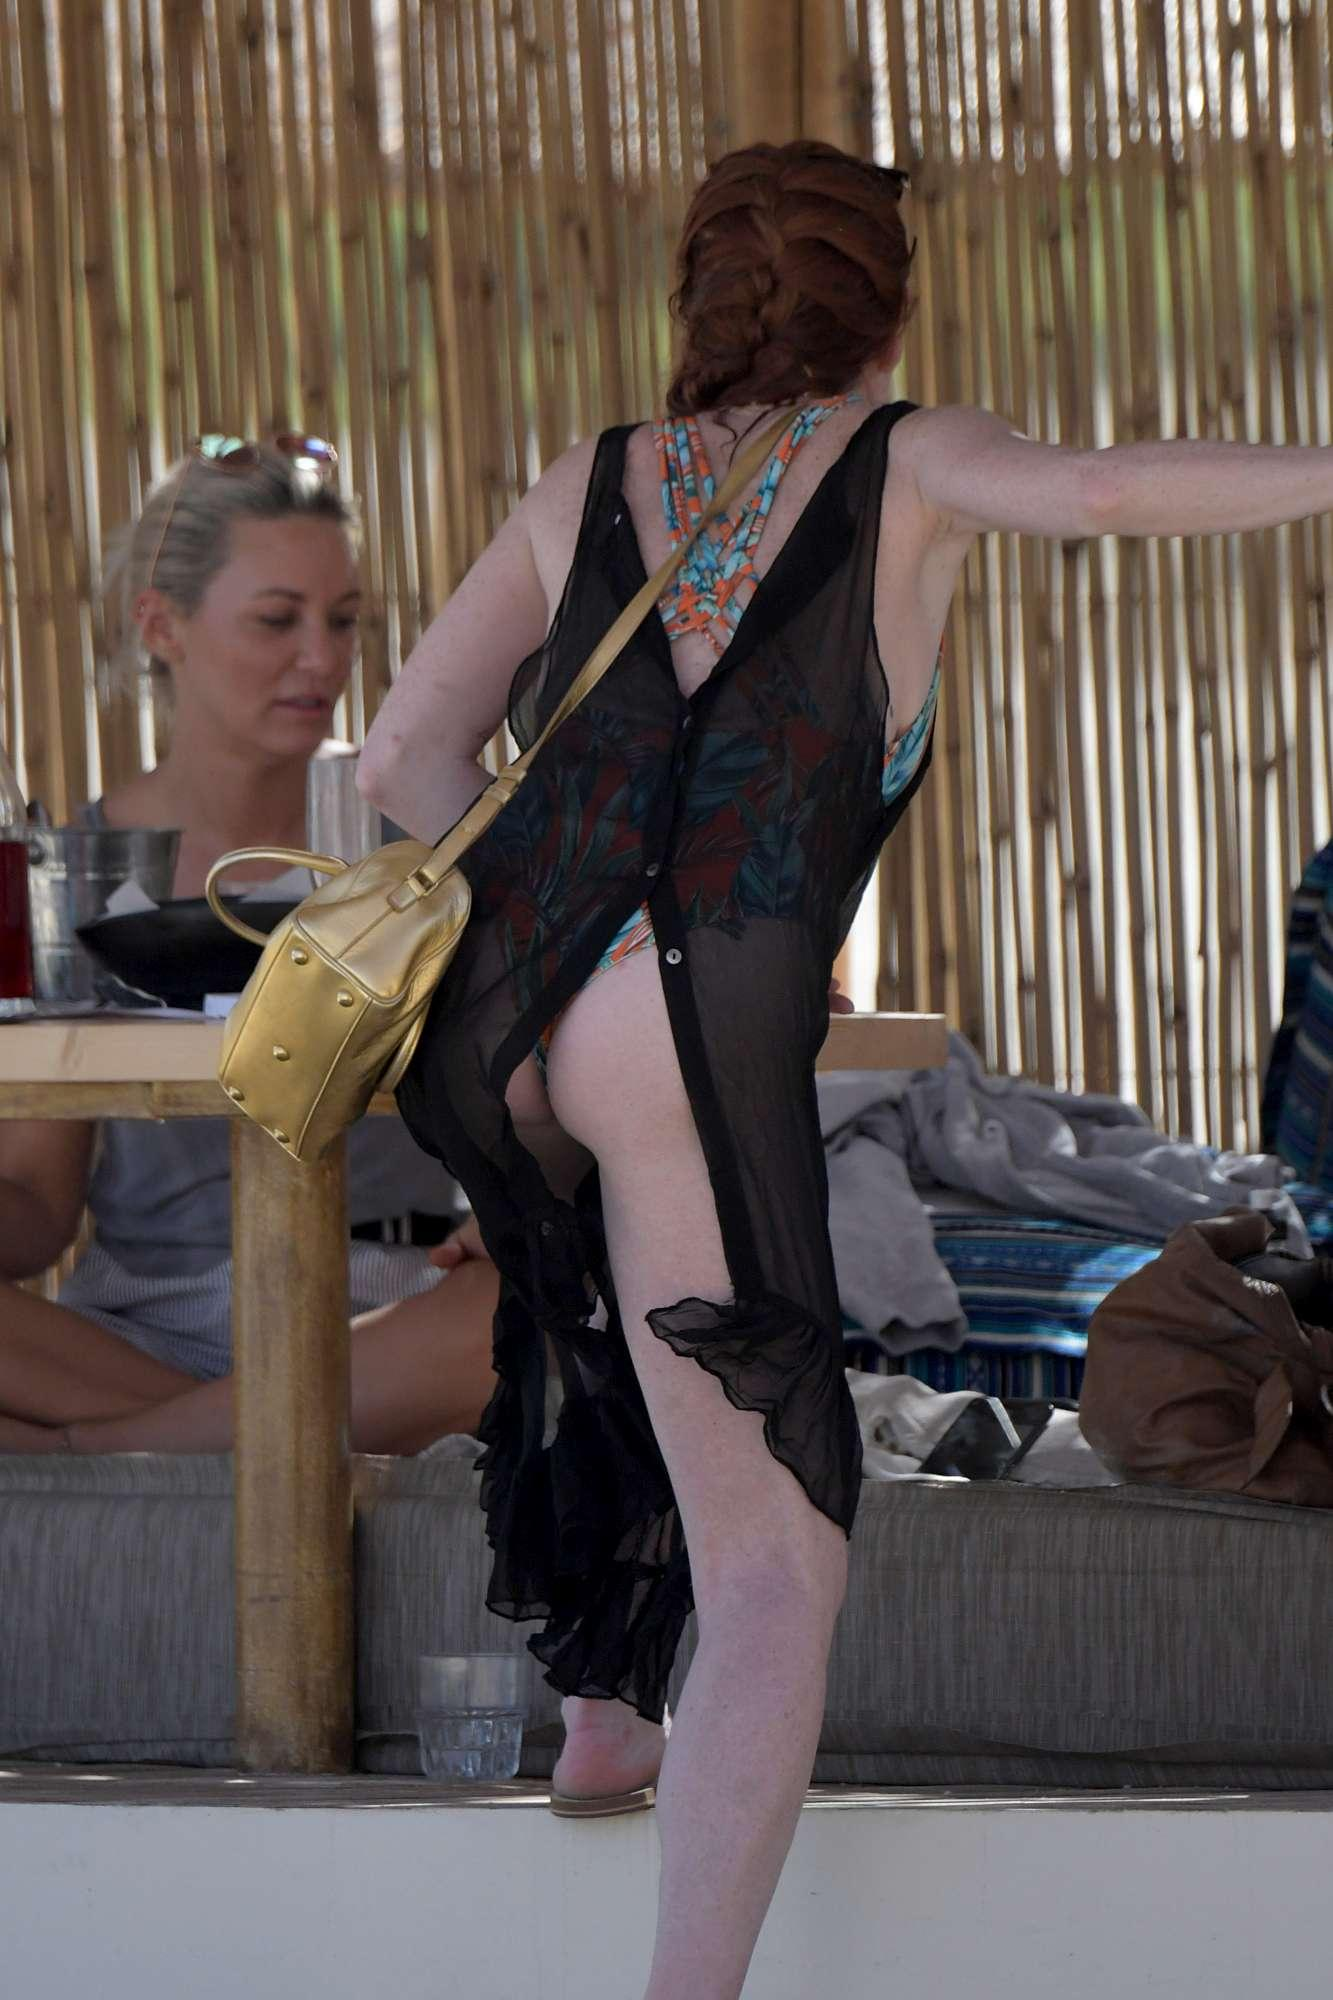 Lindsay Lohan, lato B in mostra in vacanza a Mykonos